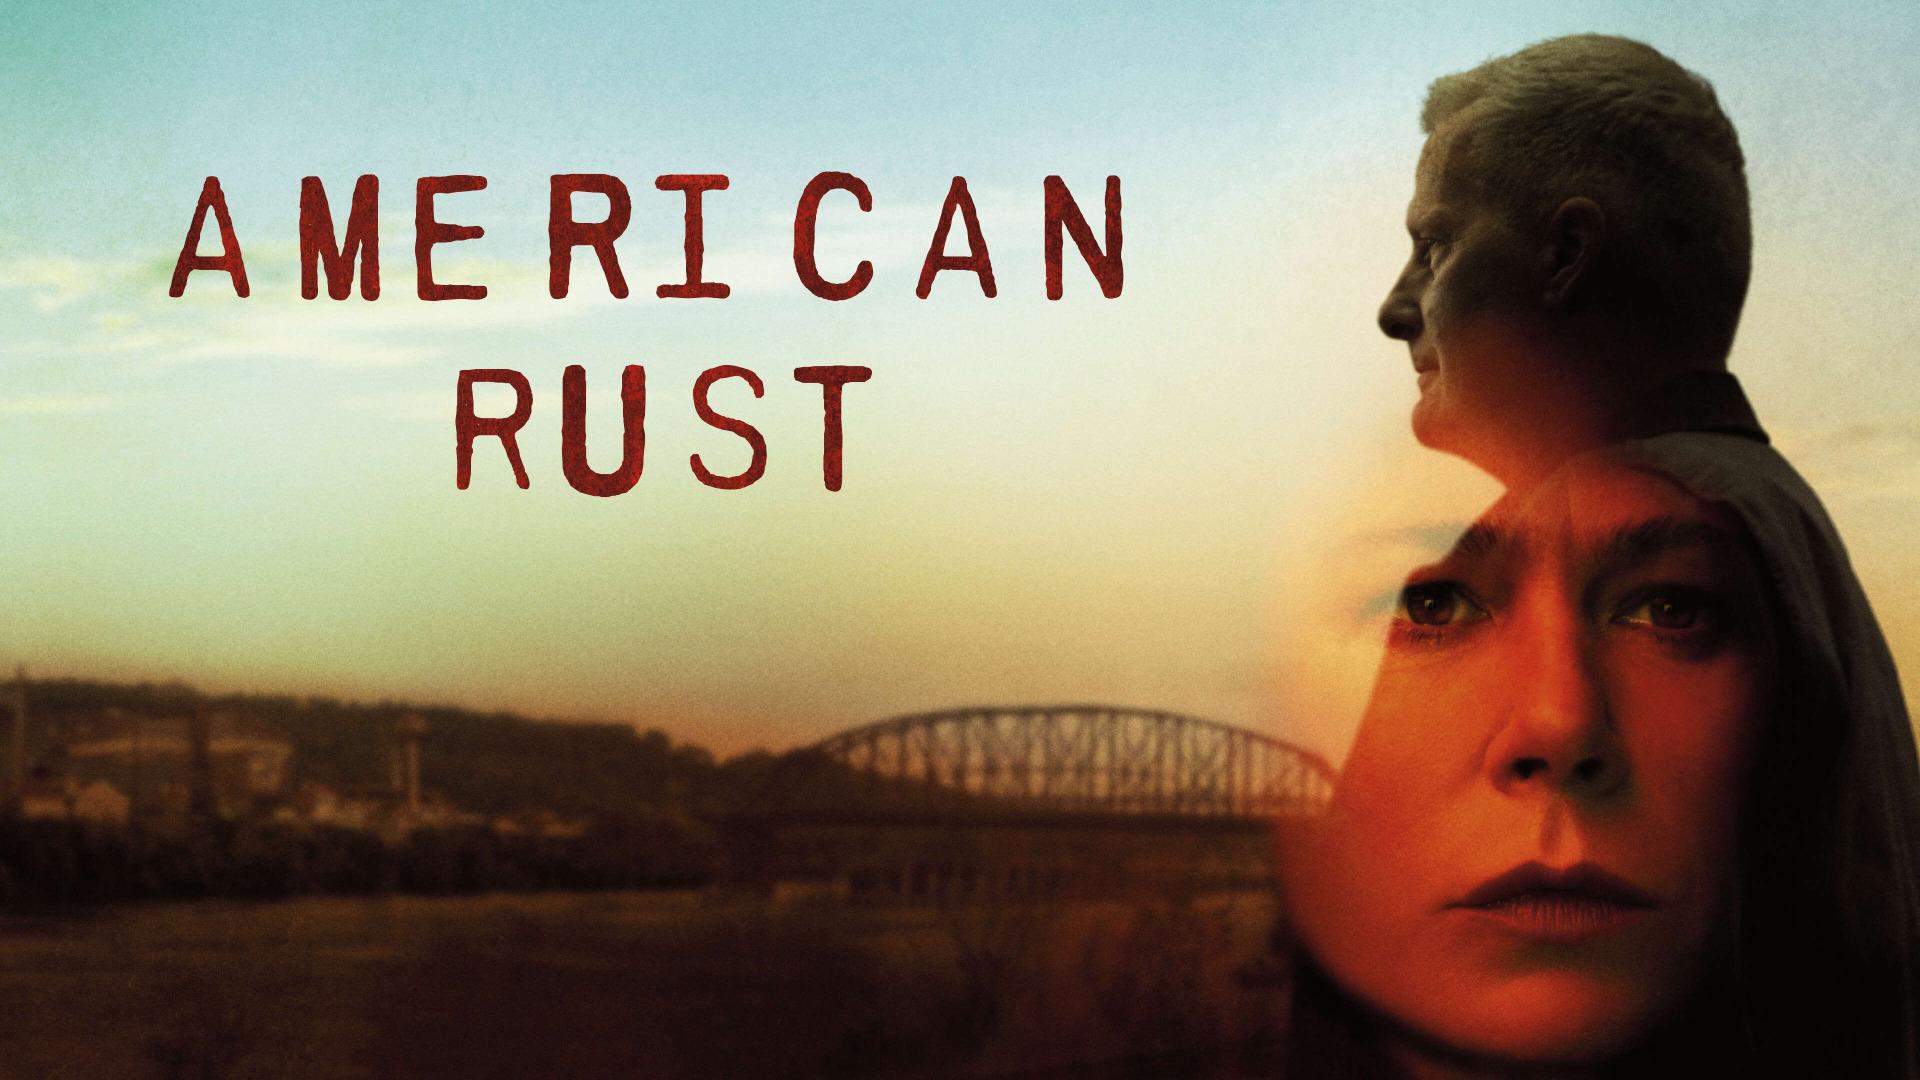 Show American Rust